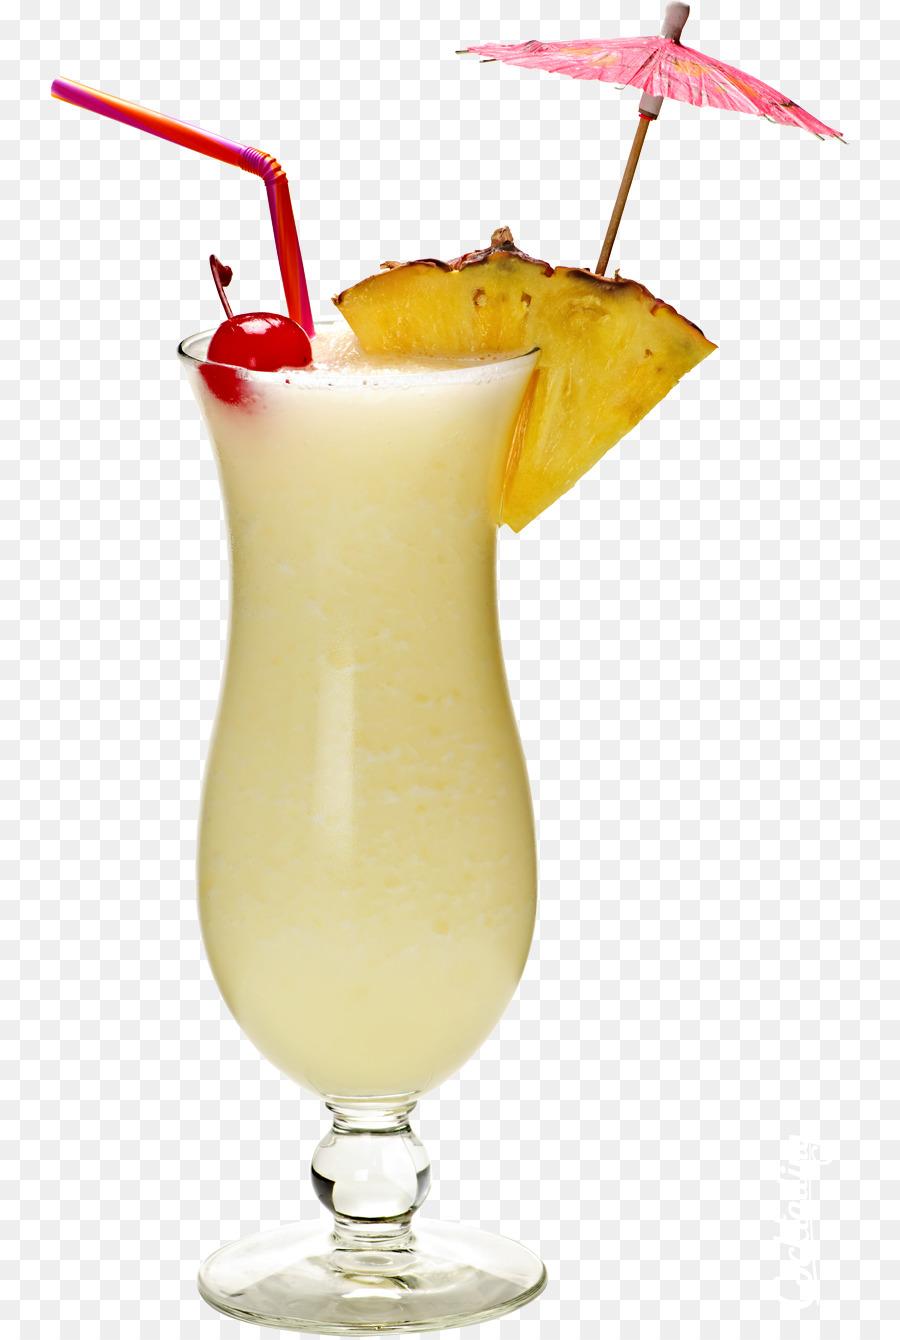 Coconut Cartoon clipart.